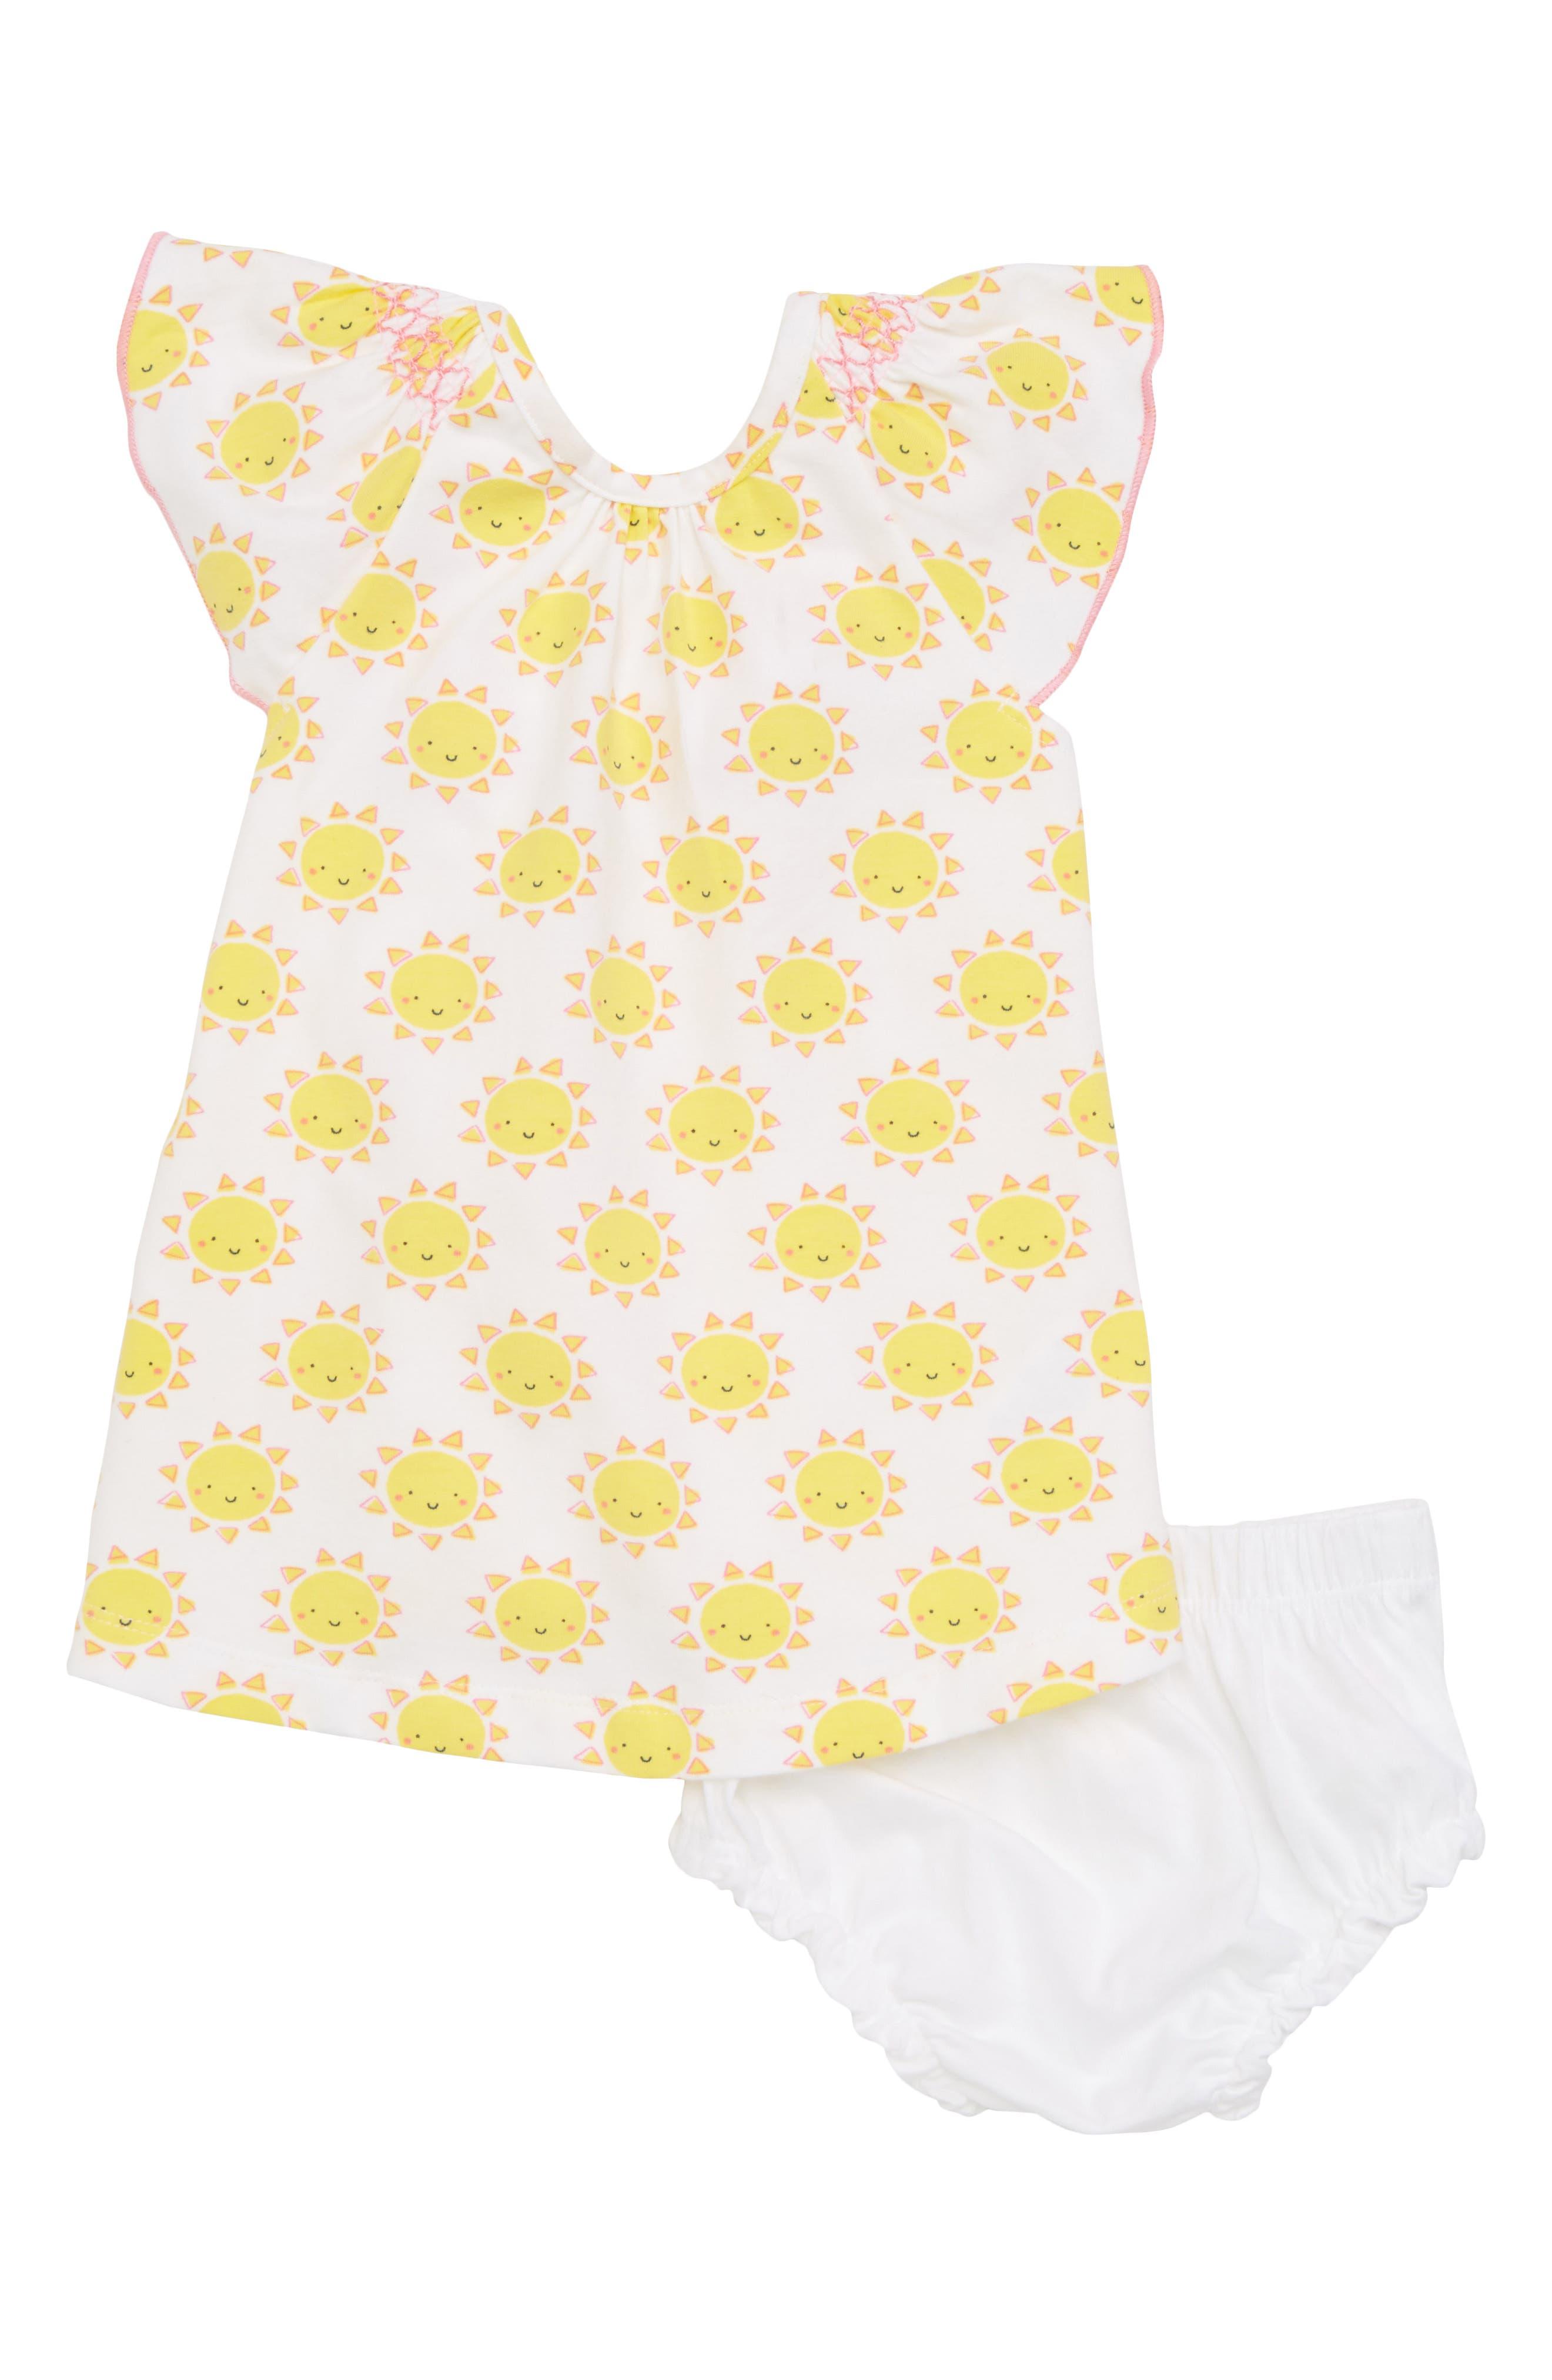 Merry Sunshine Dress,                         Main,                         color, 100